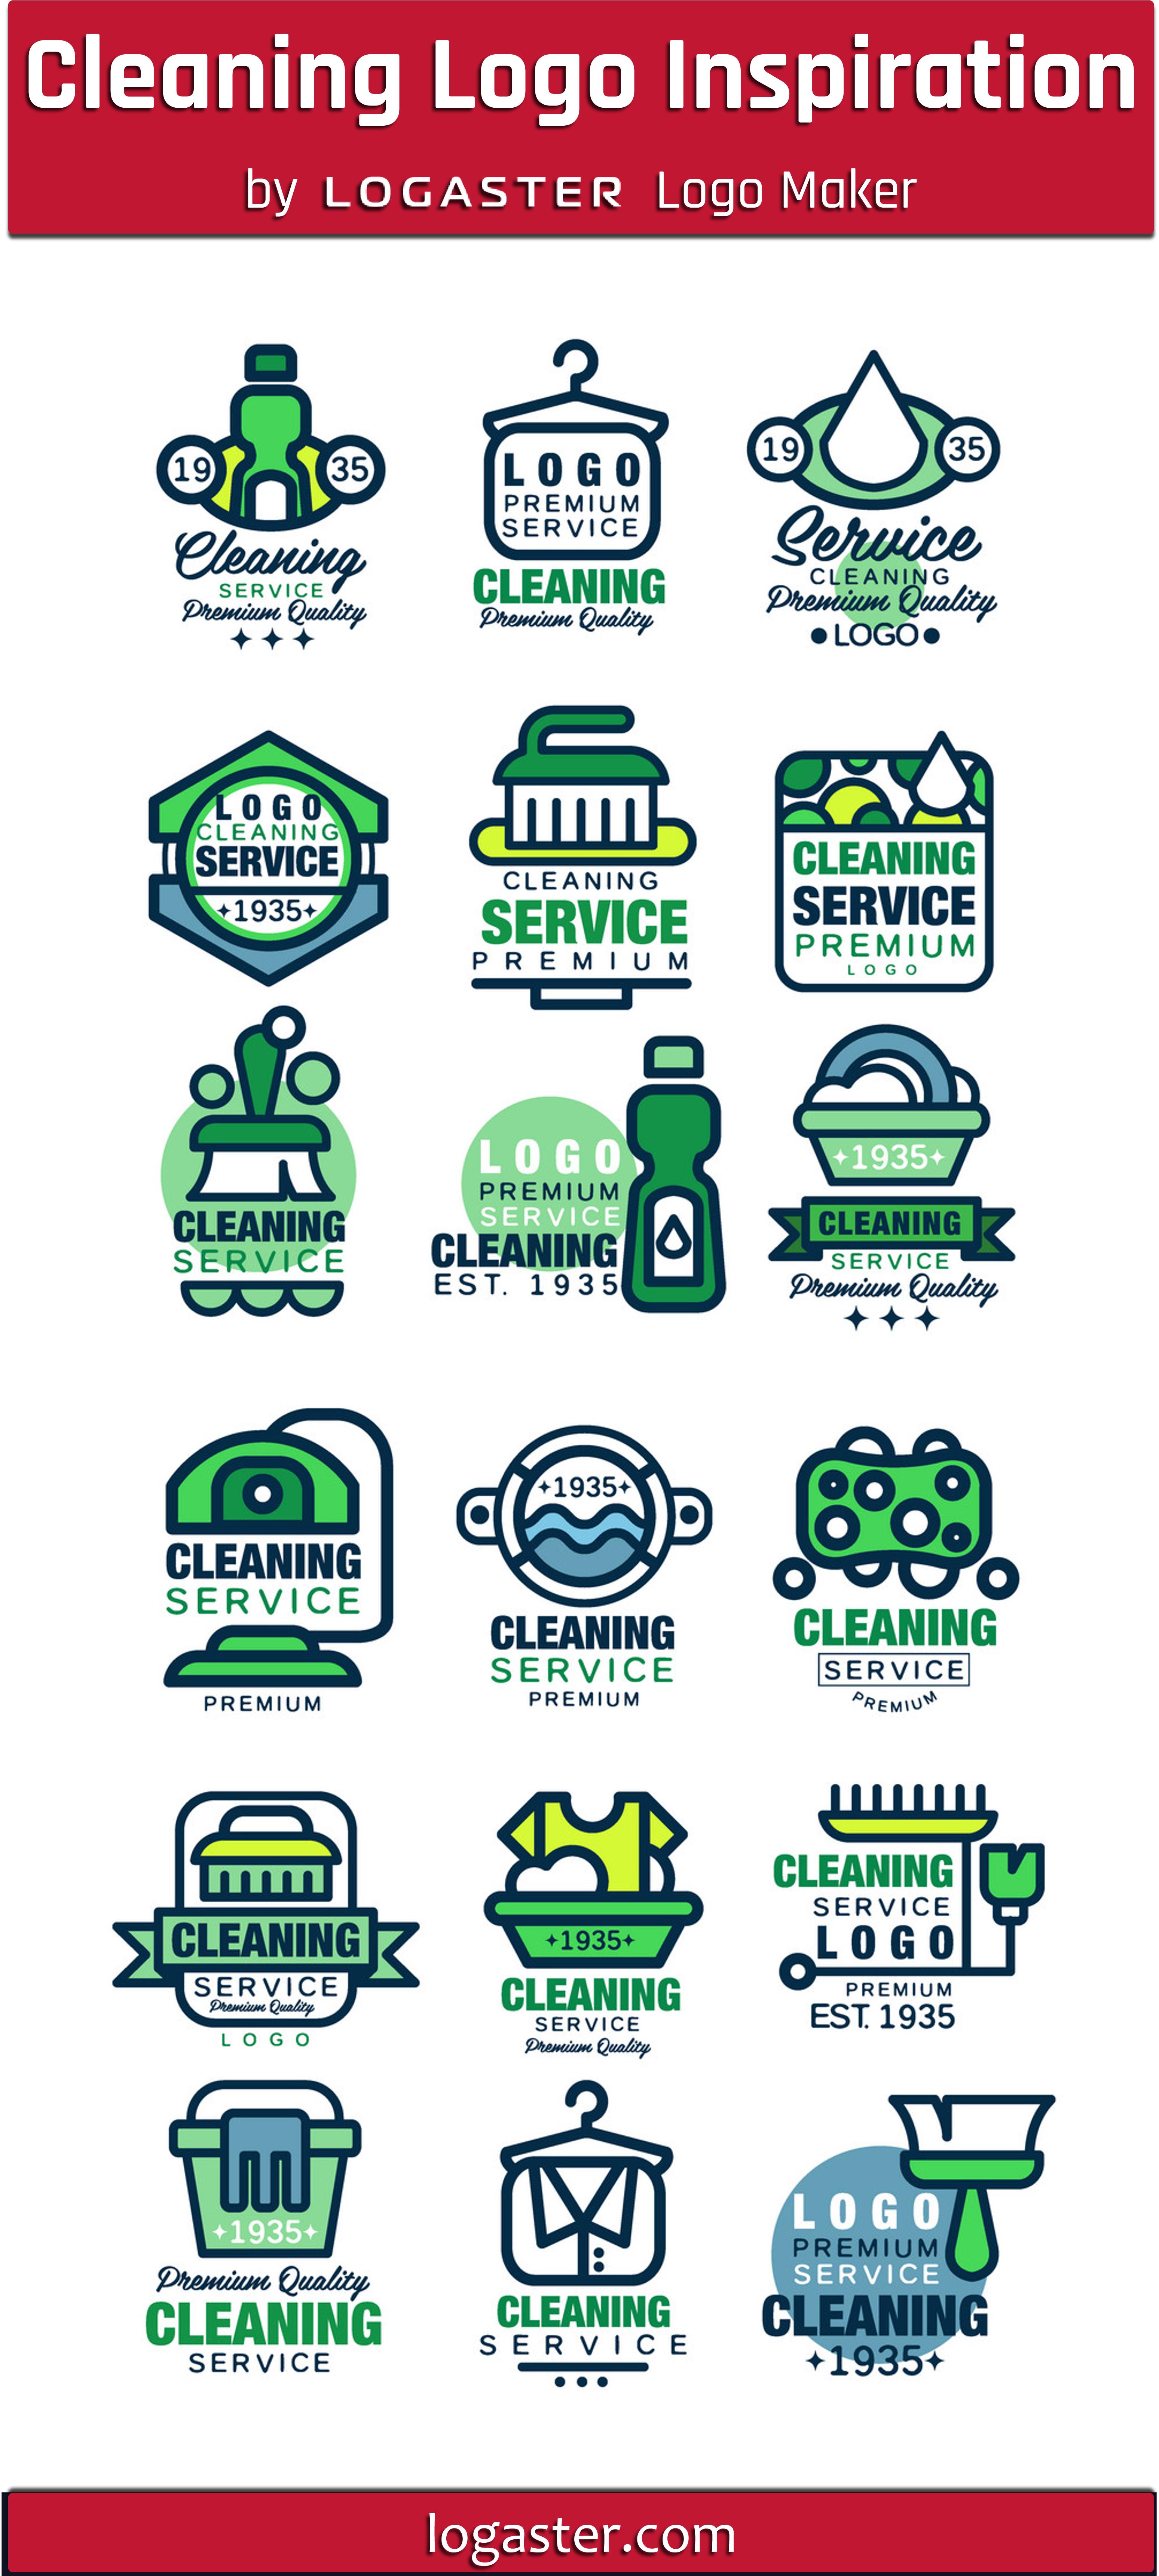 Cleaning Logo Inspiration By Logaster Logo Maker Cleaning Logo Cleaning Service Logo Clean Logo Design